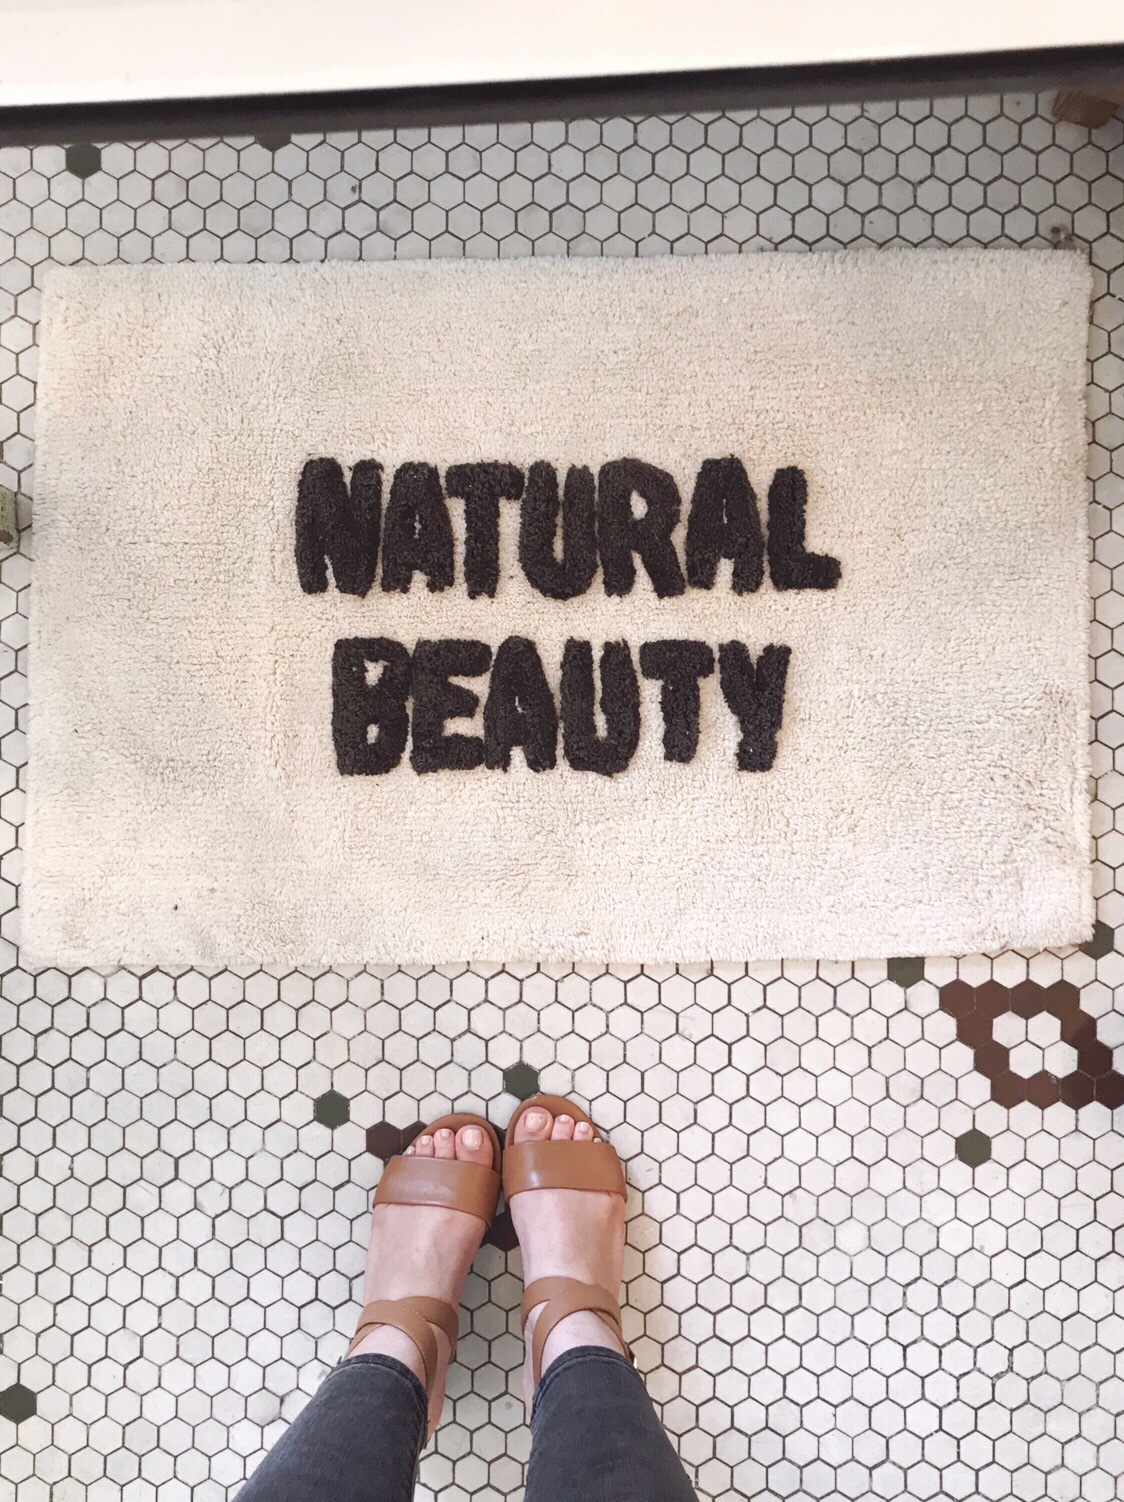 Bathmat that says 'Natural Beauty' on a vintage tile floor